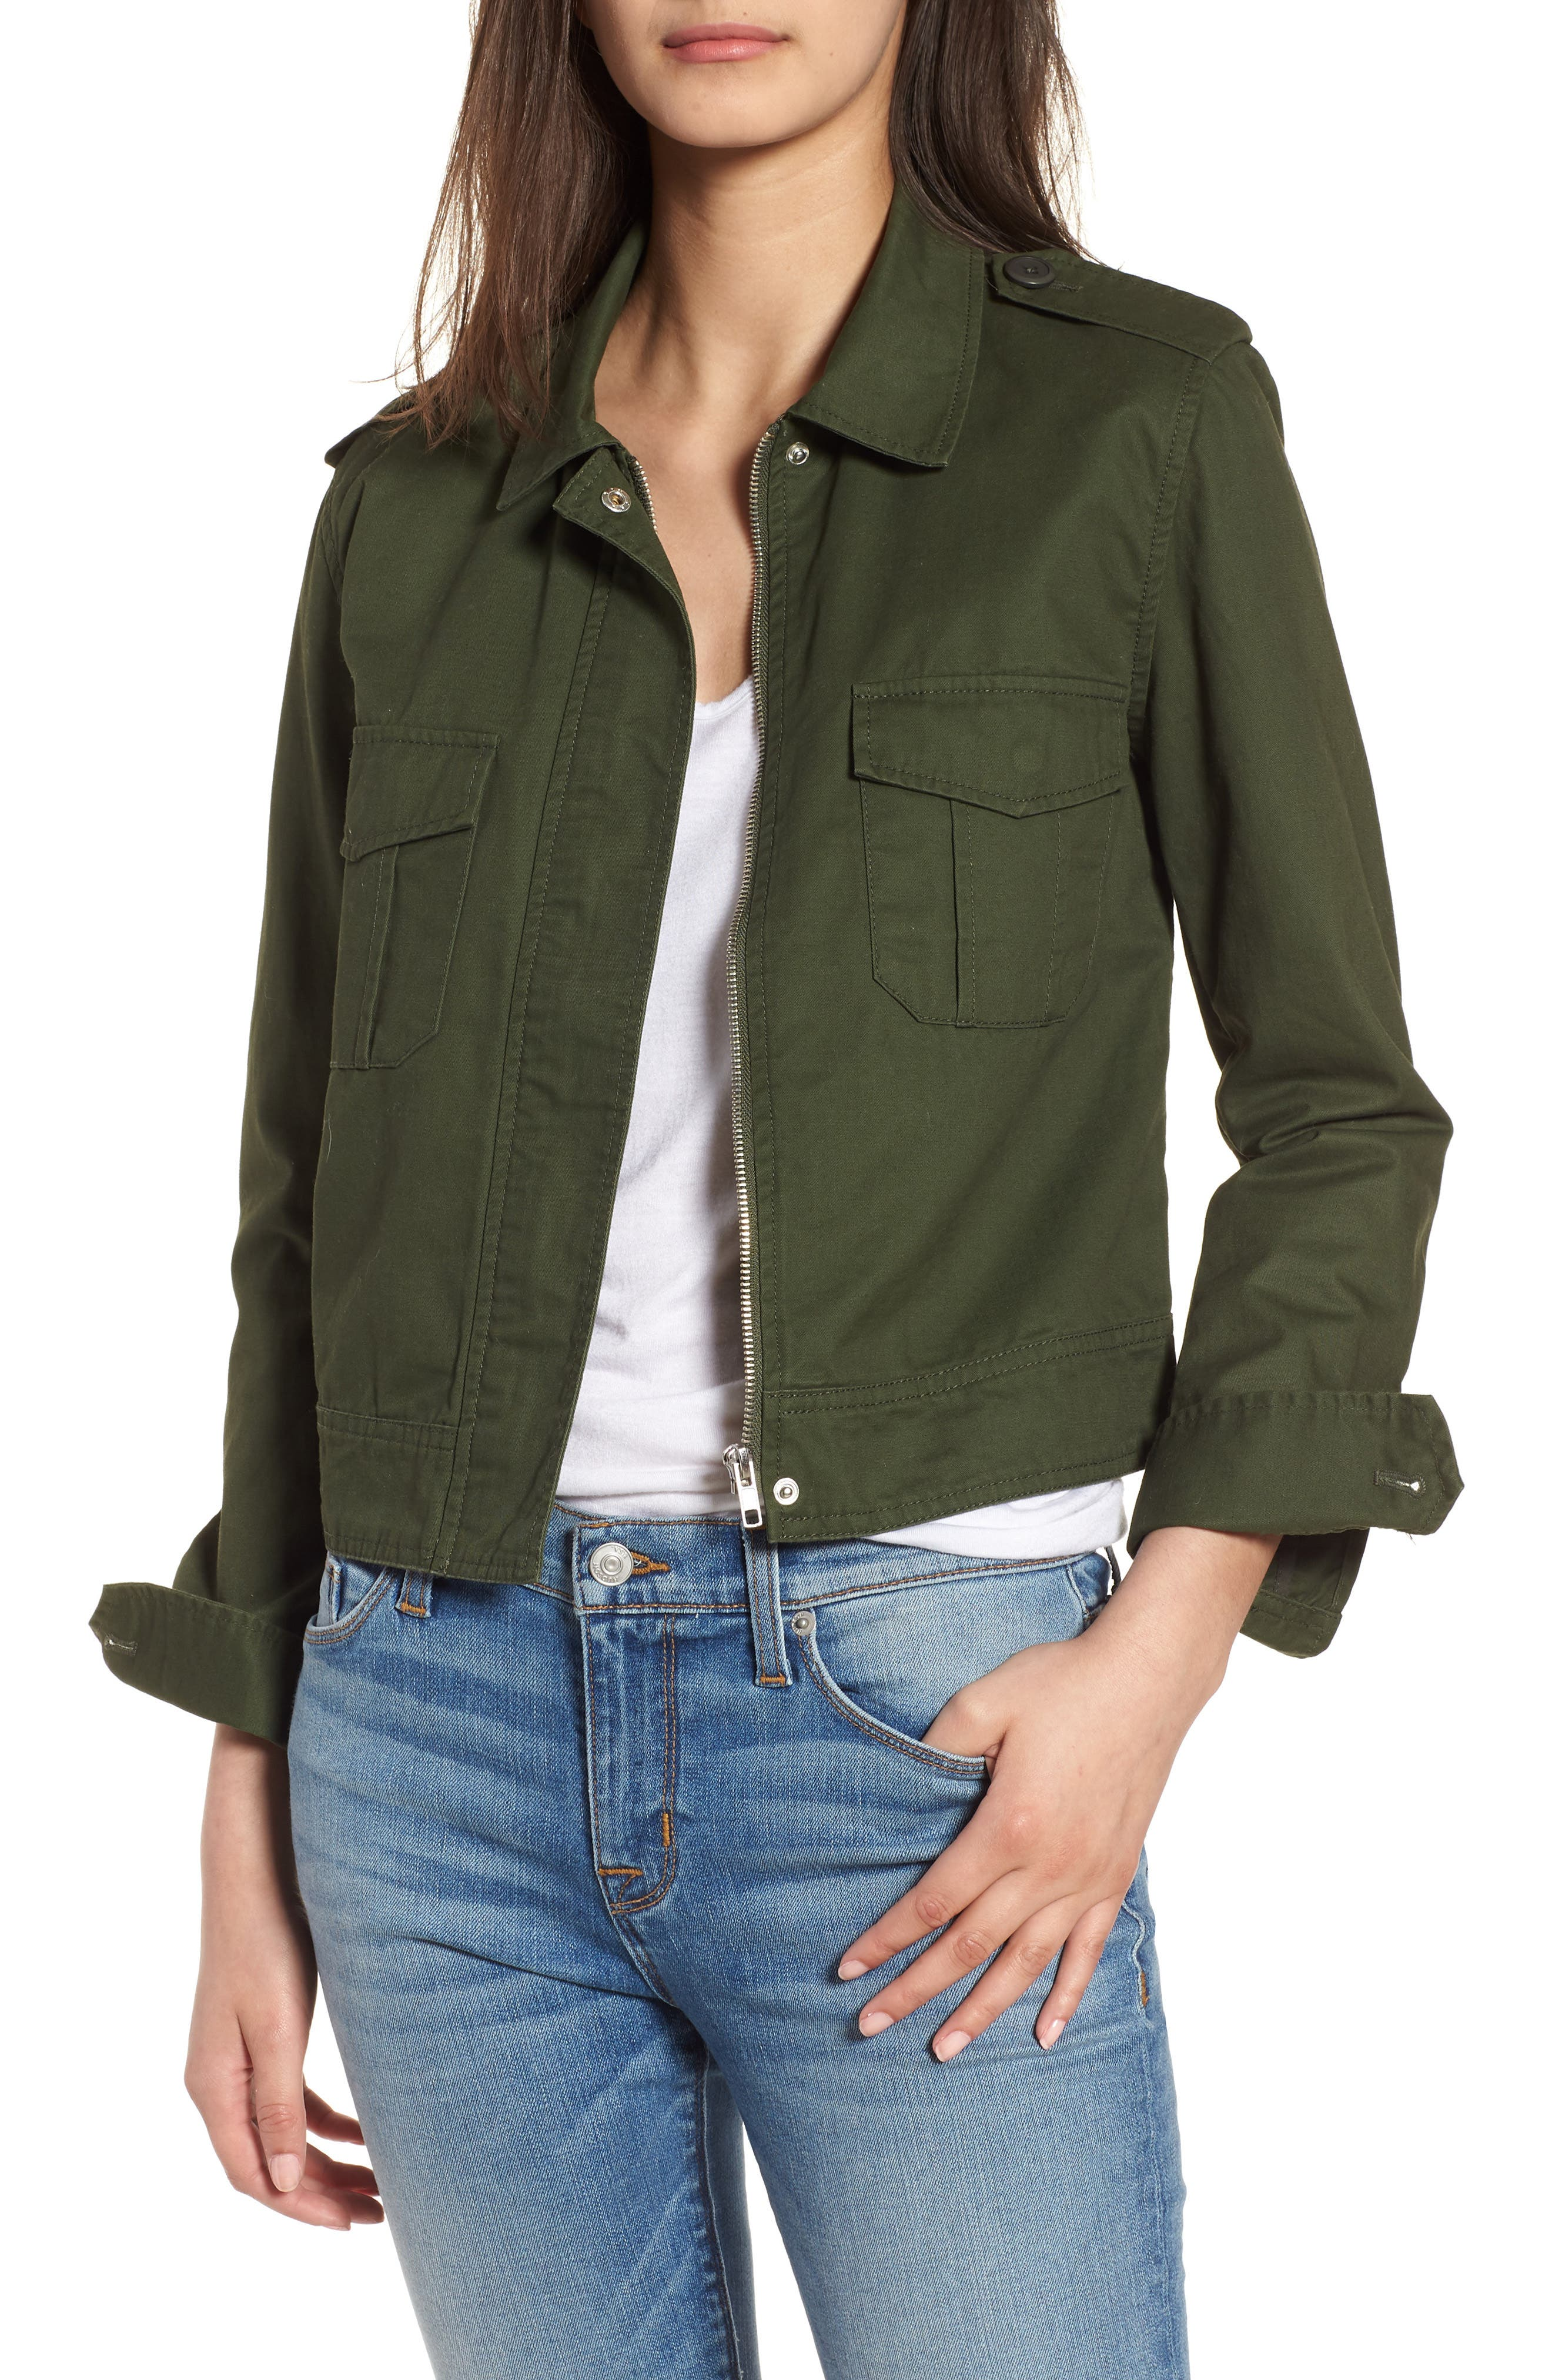 Maddox Cotton Twill Army Jacket,                             Main thumbnail 1, color,                             301